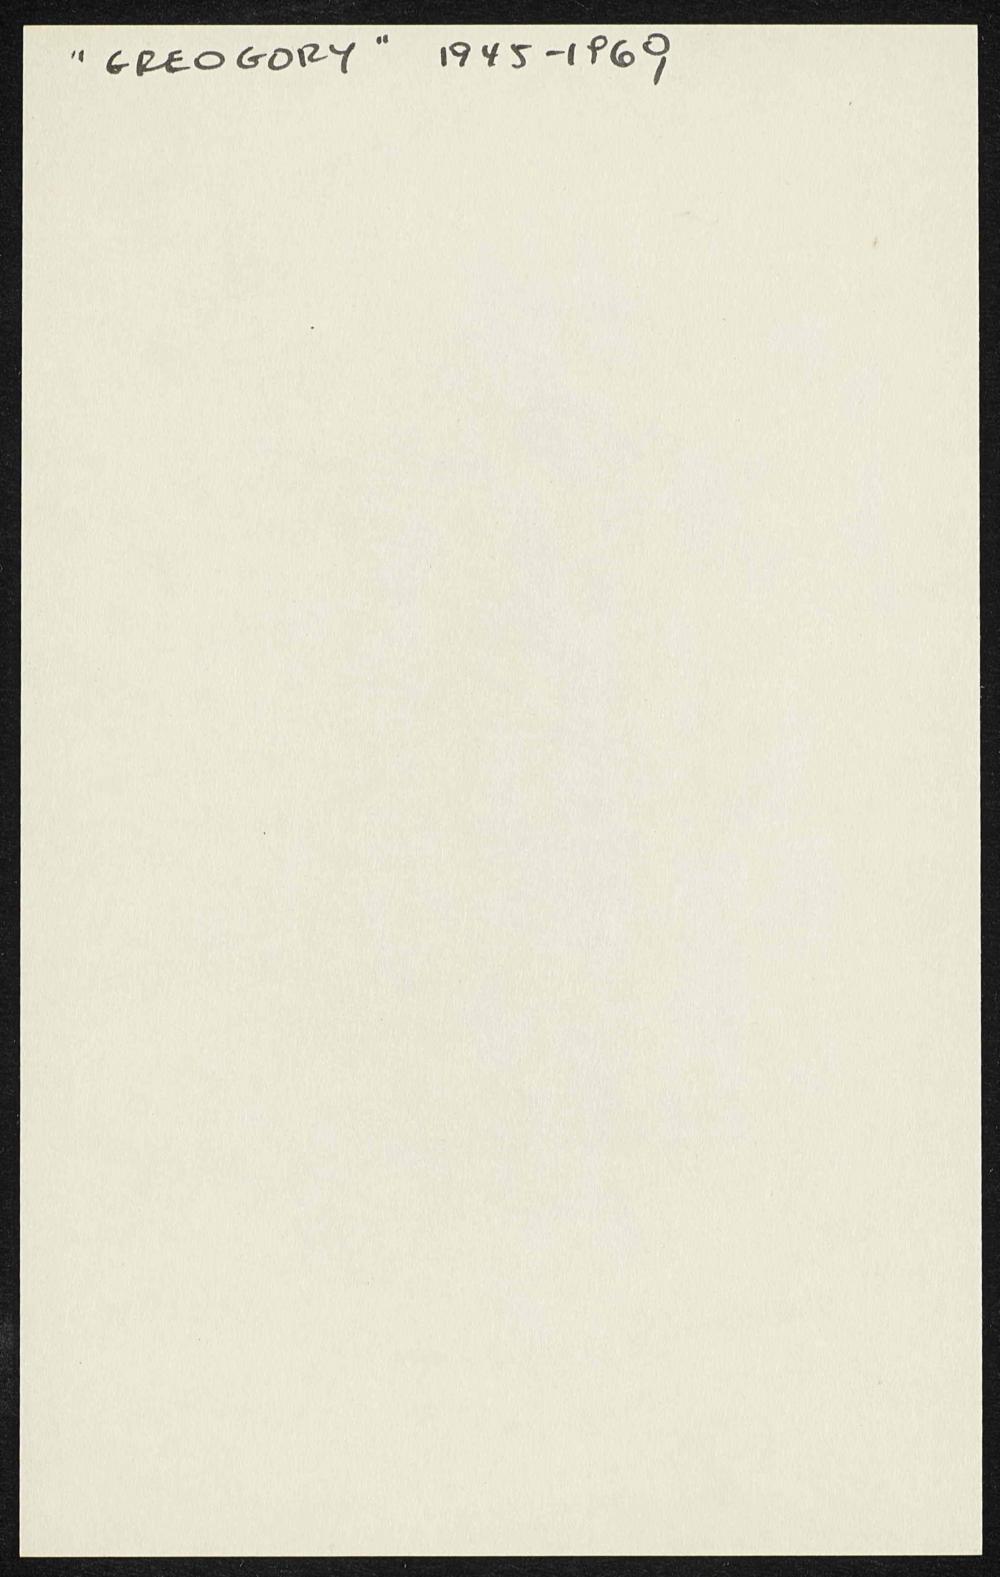 Nasher Collection exhibition brochure